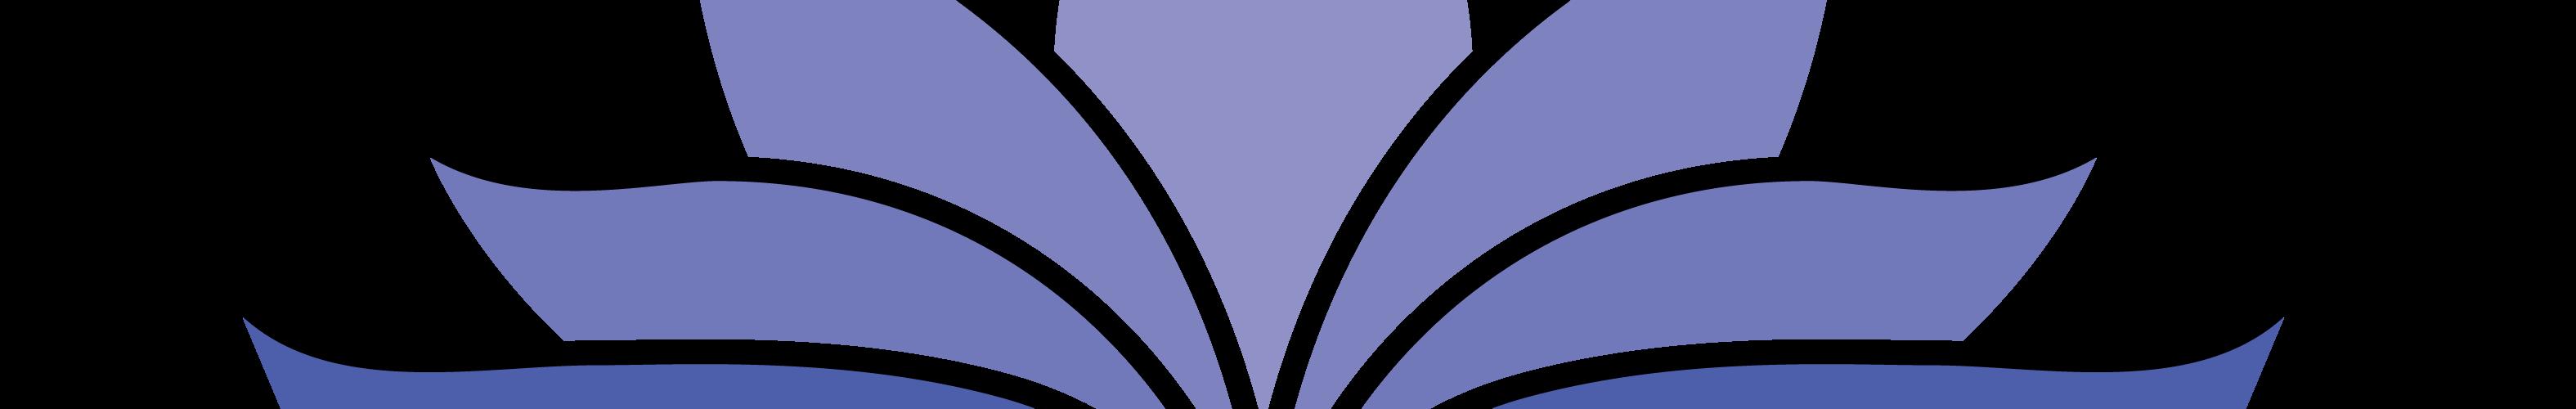 rlc_lotus